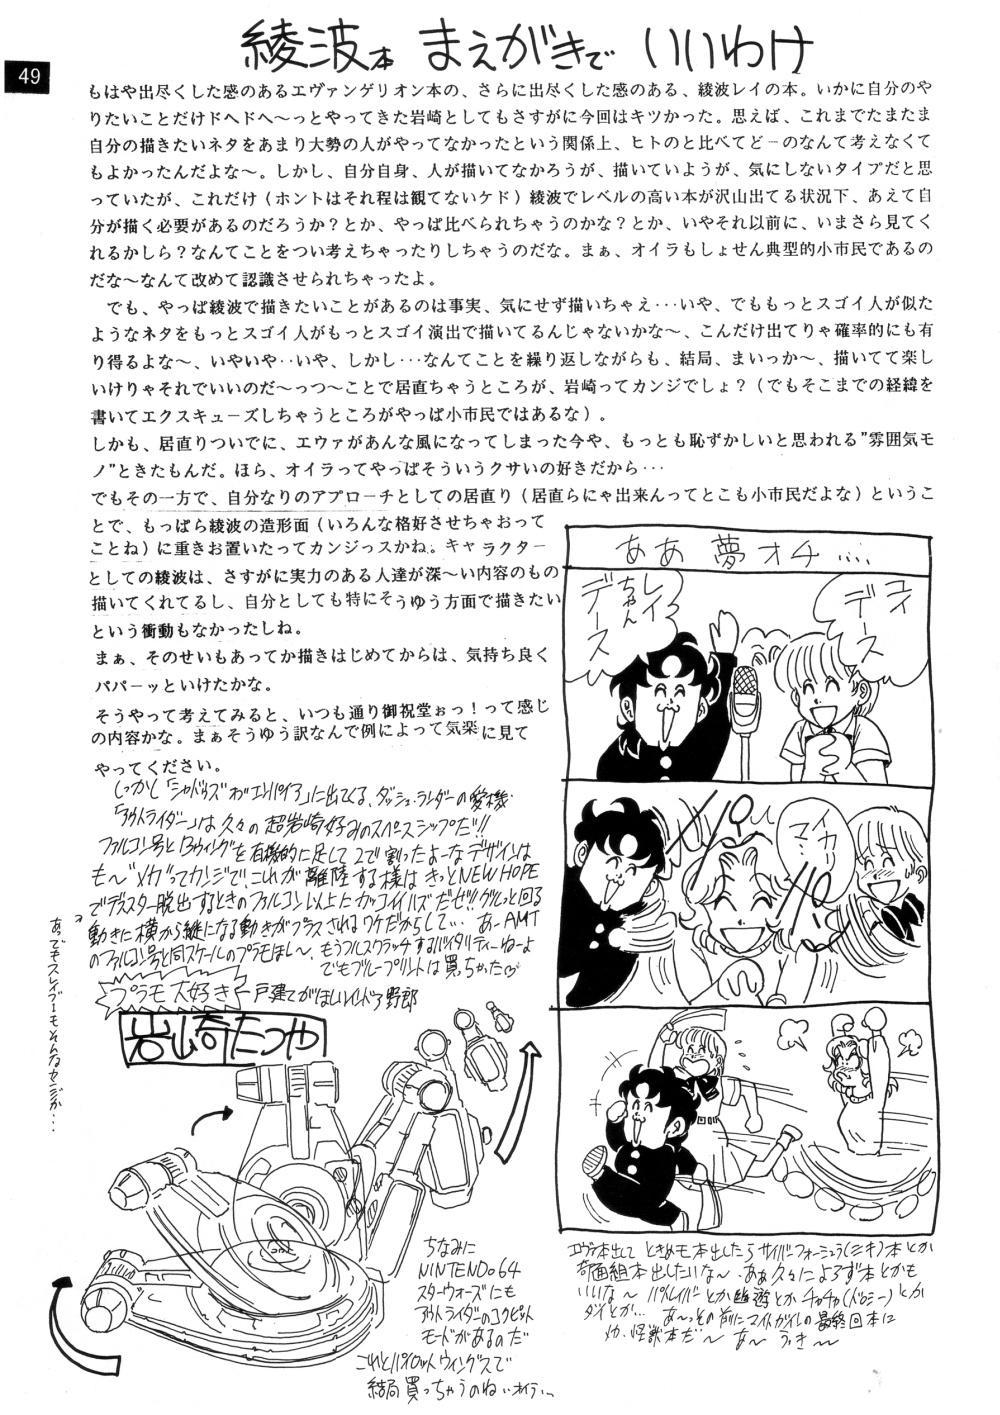 Zense Ki no Evangerikosan 49